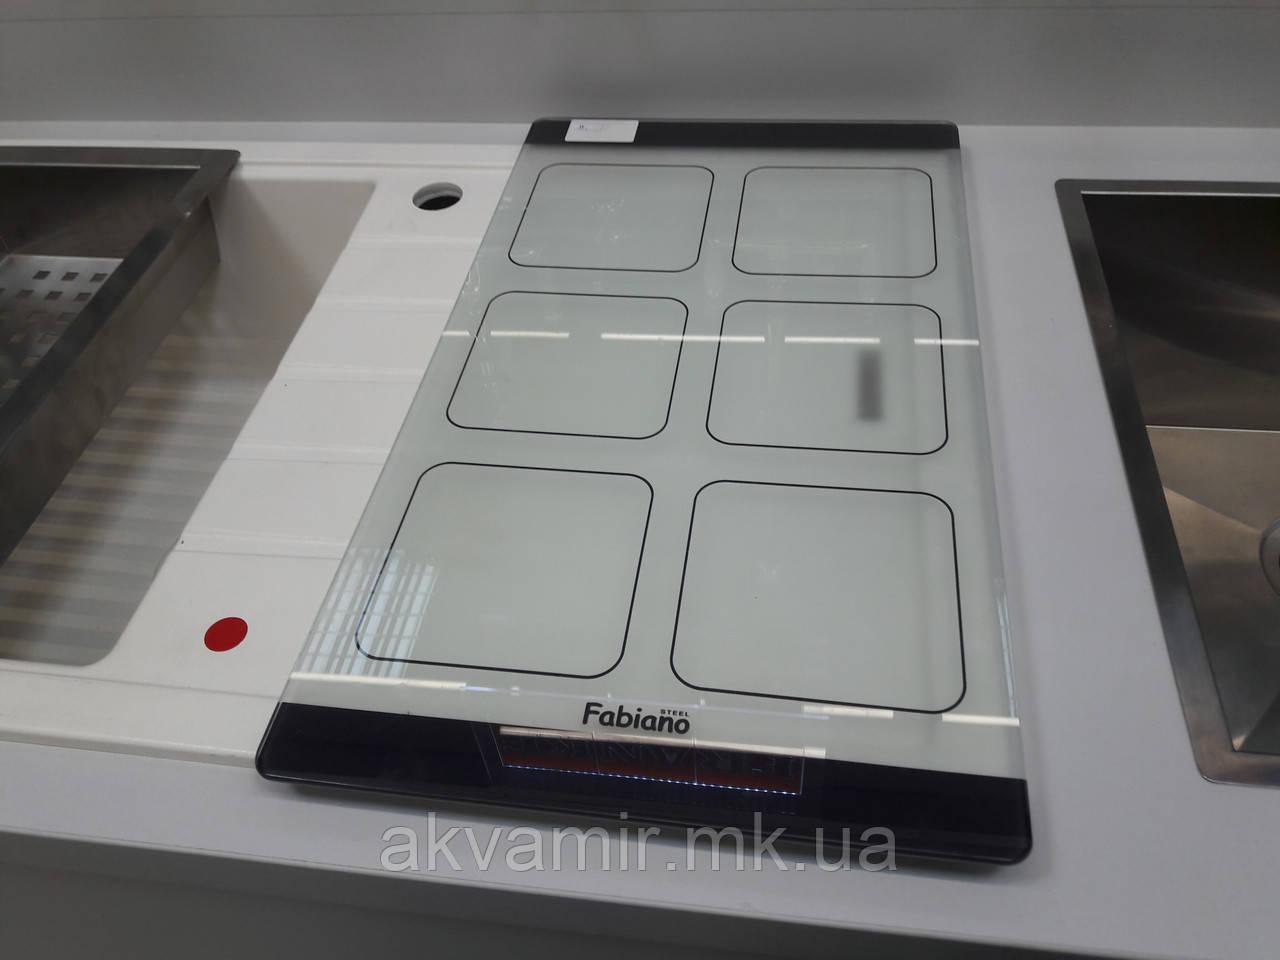 Разделочная доска Fabiano FAS-G40 (стекло)